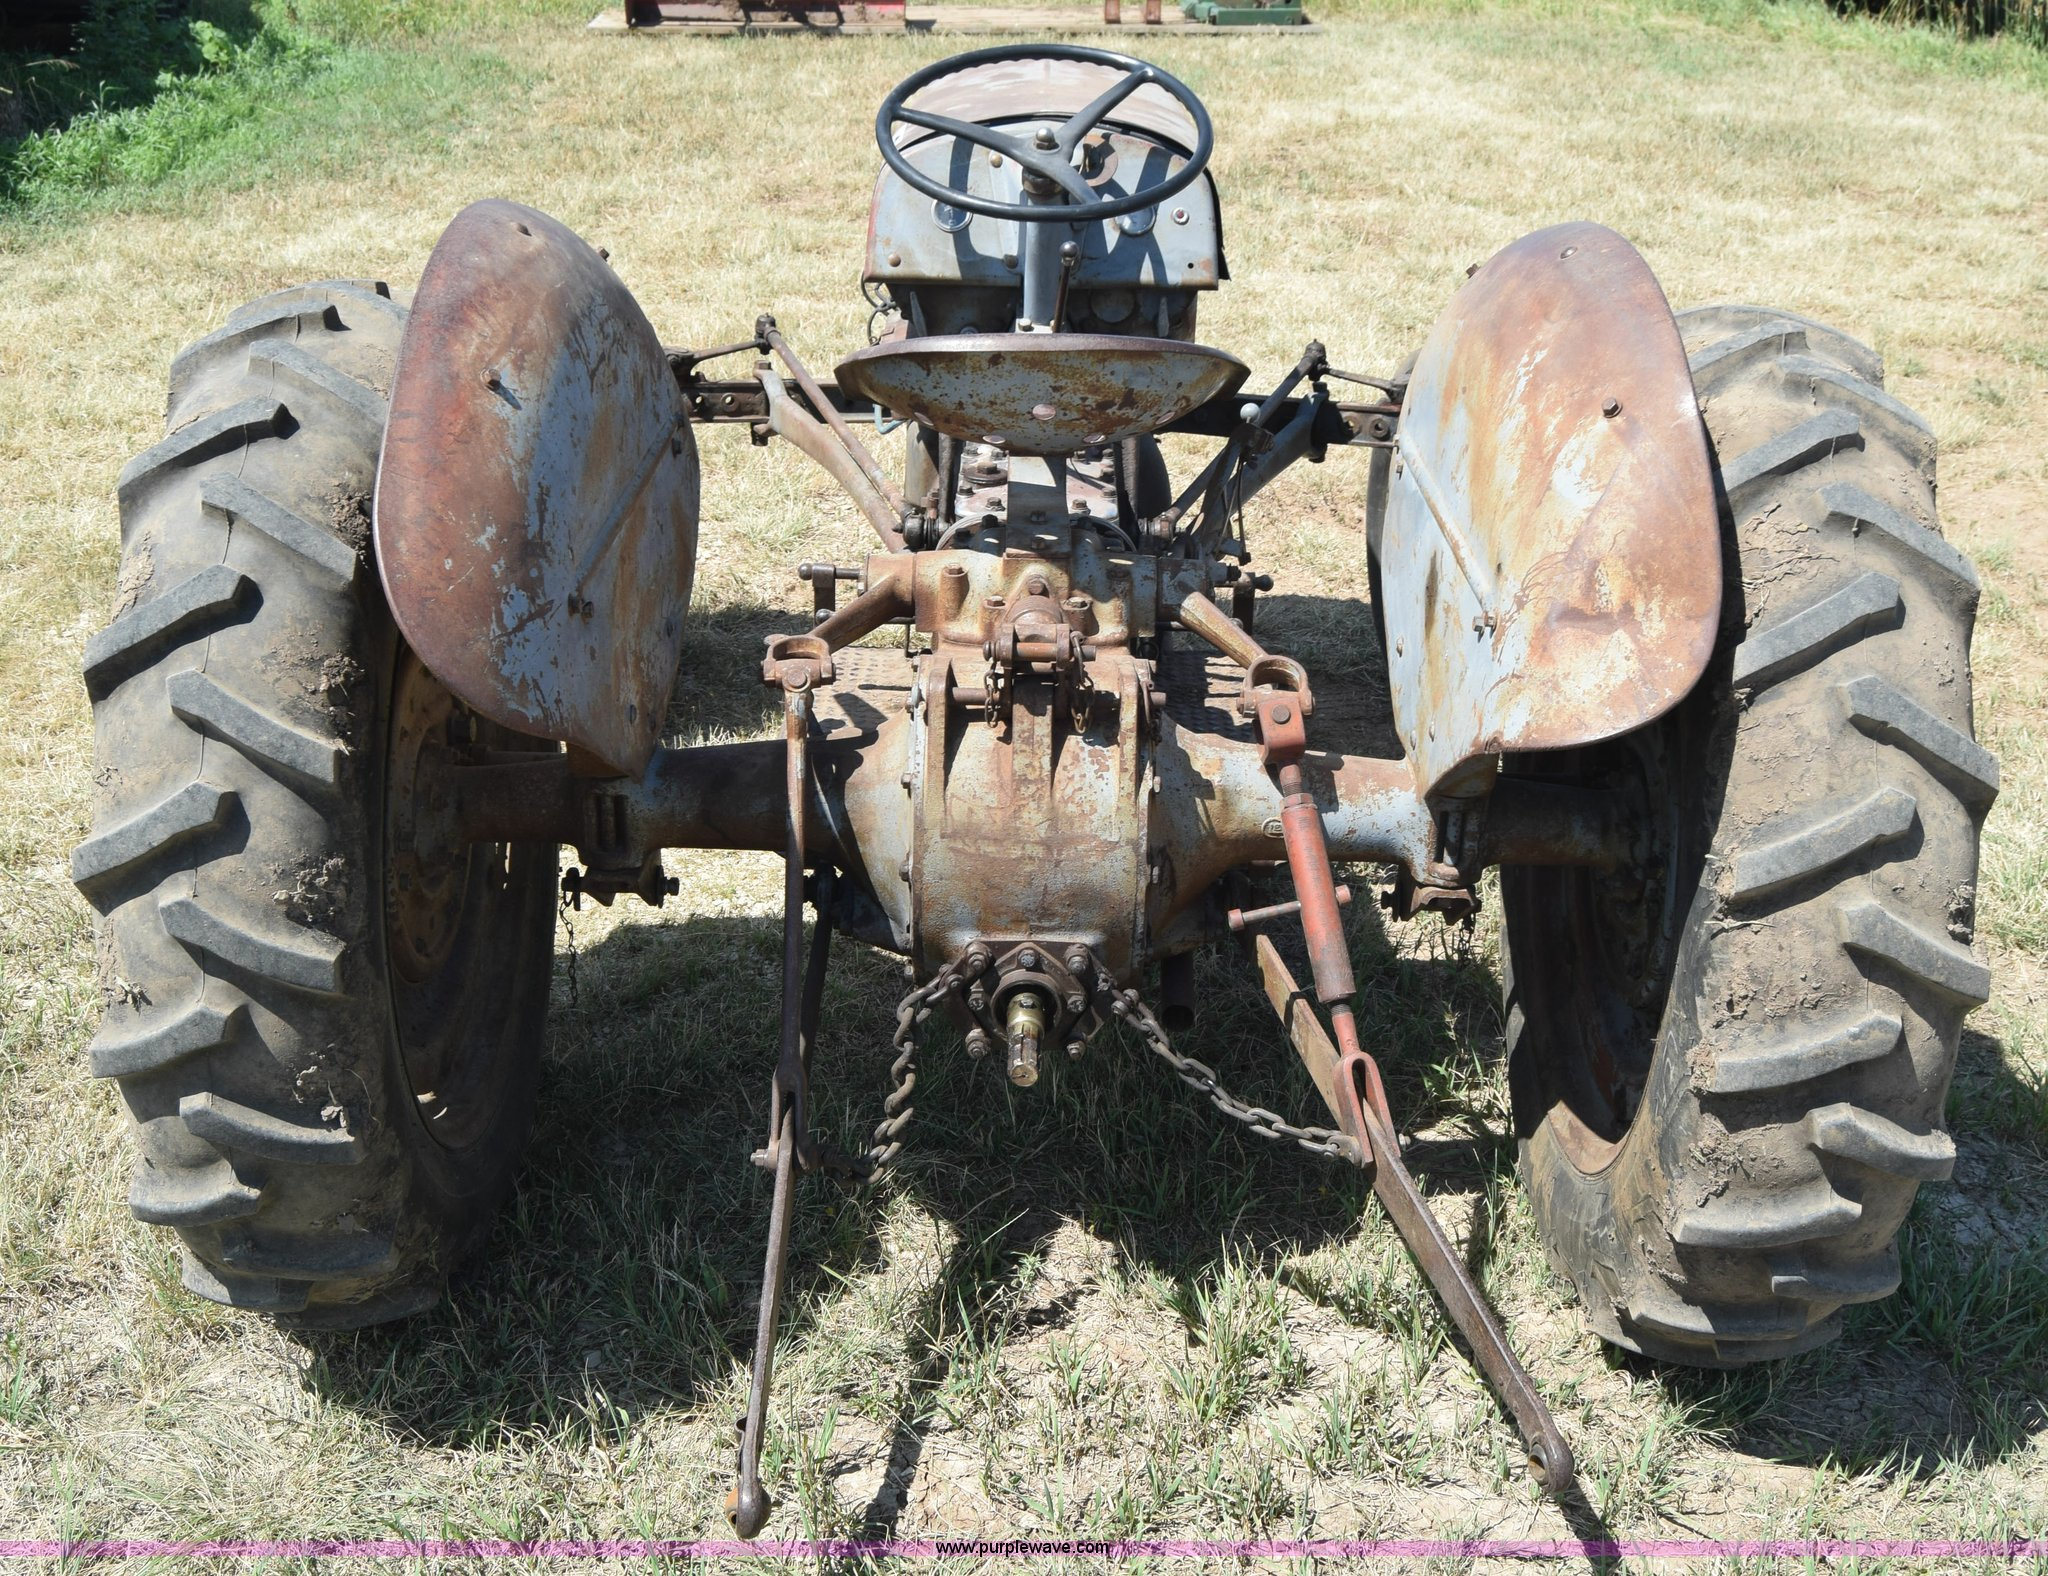 Massey-Ferguson TE20 tractor   Item J7939   SOLD! August 12